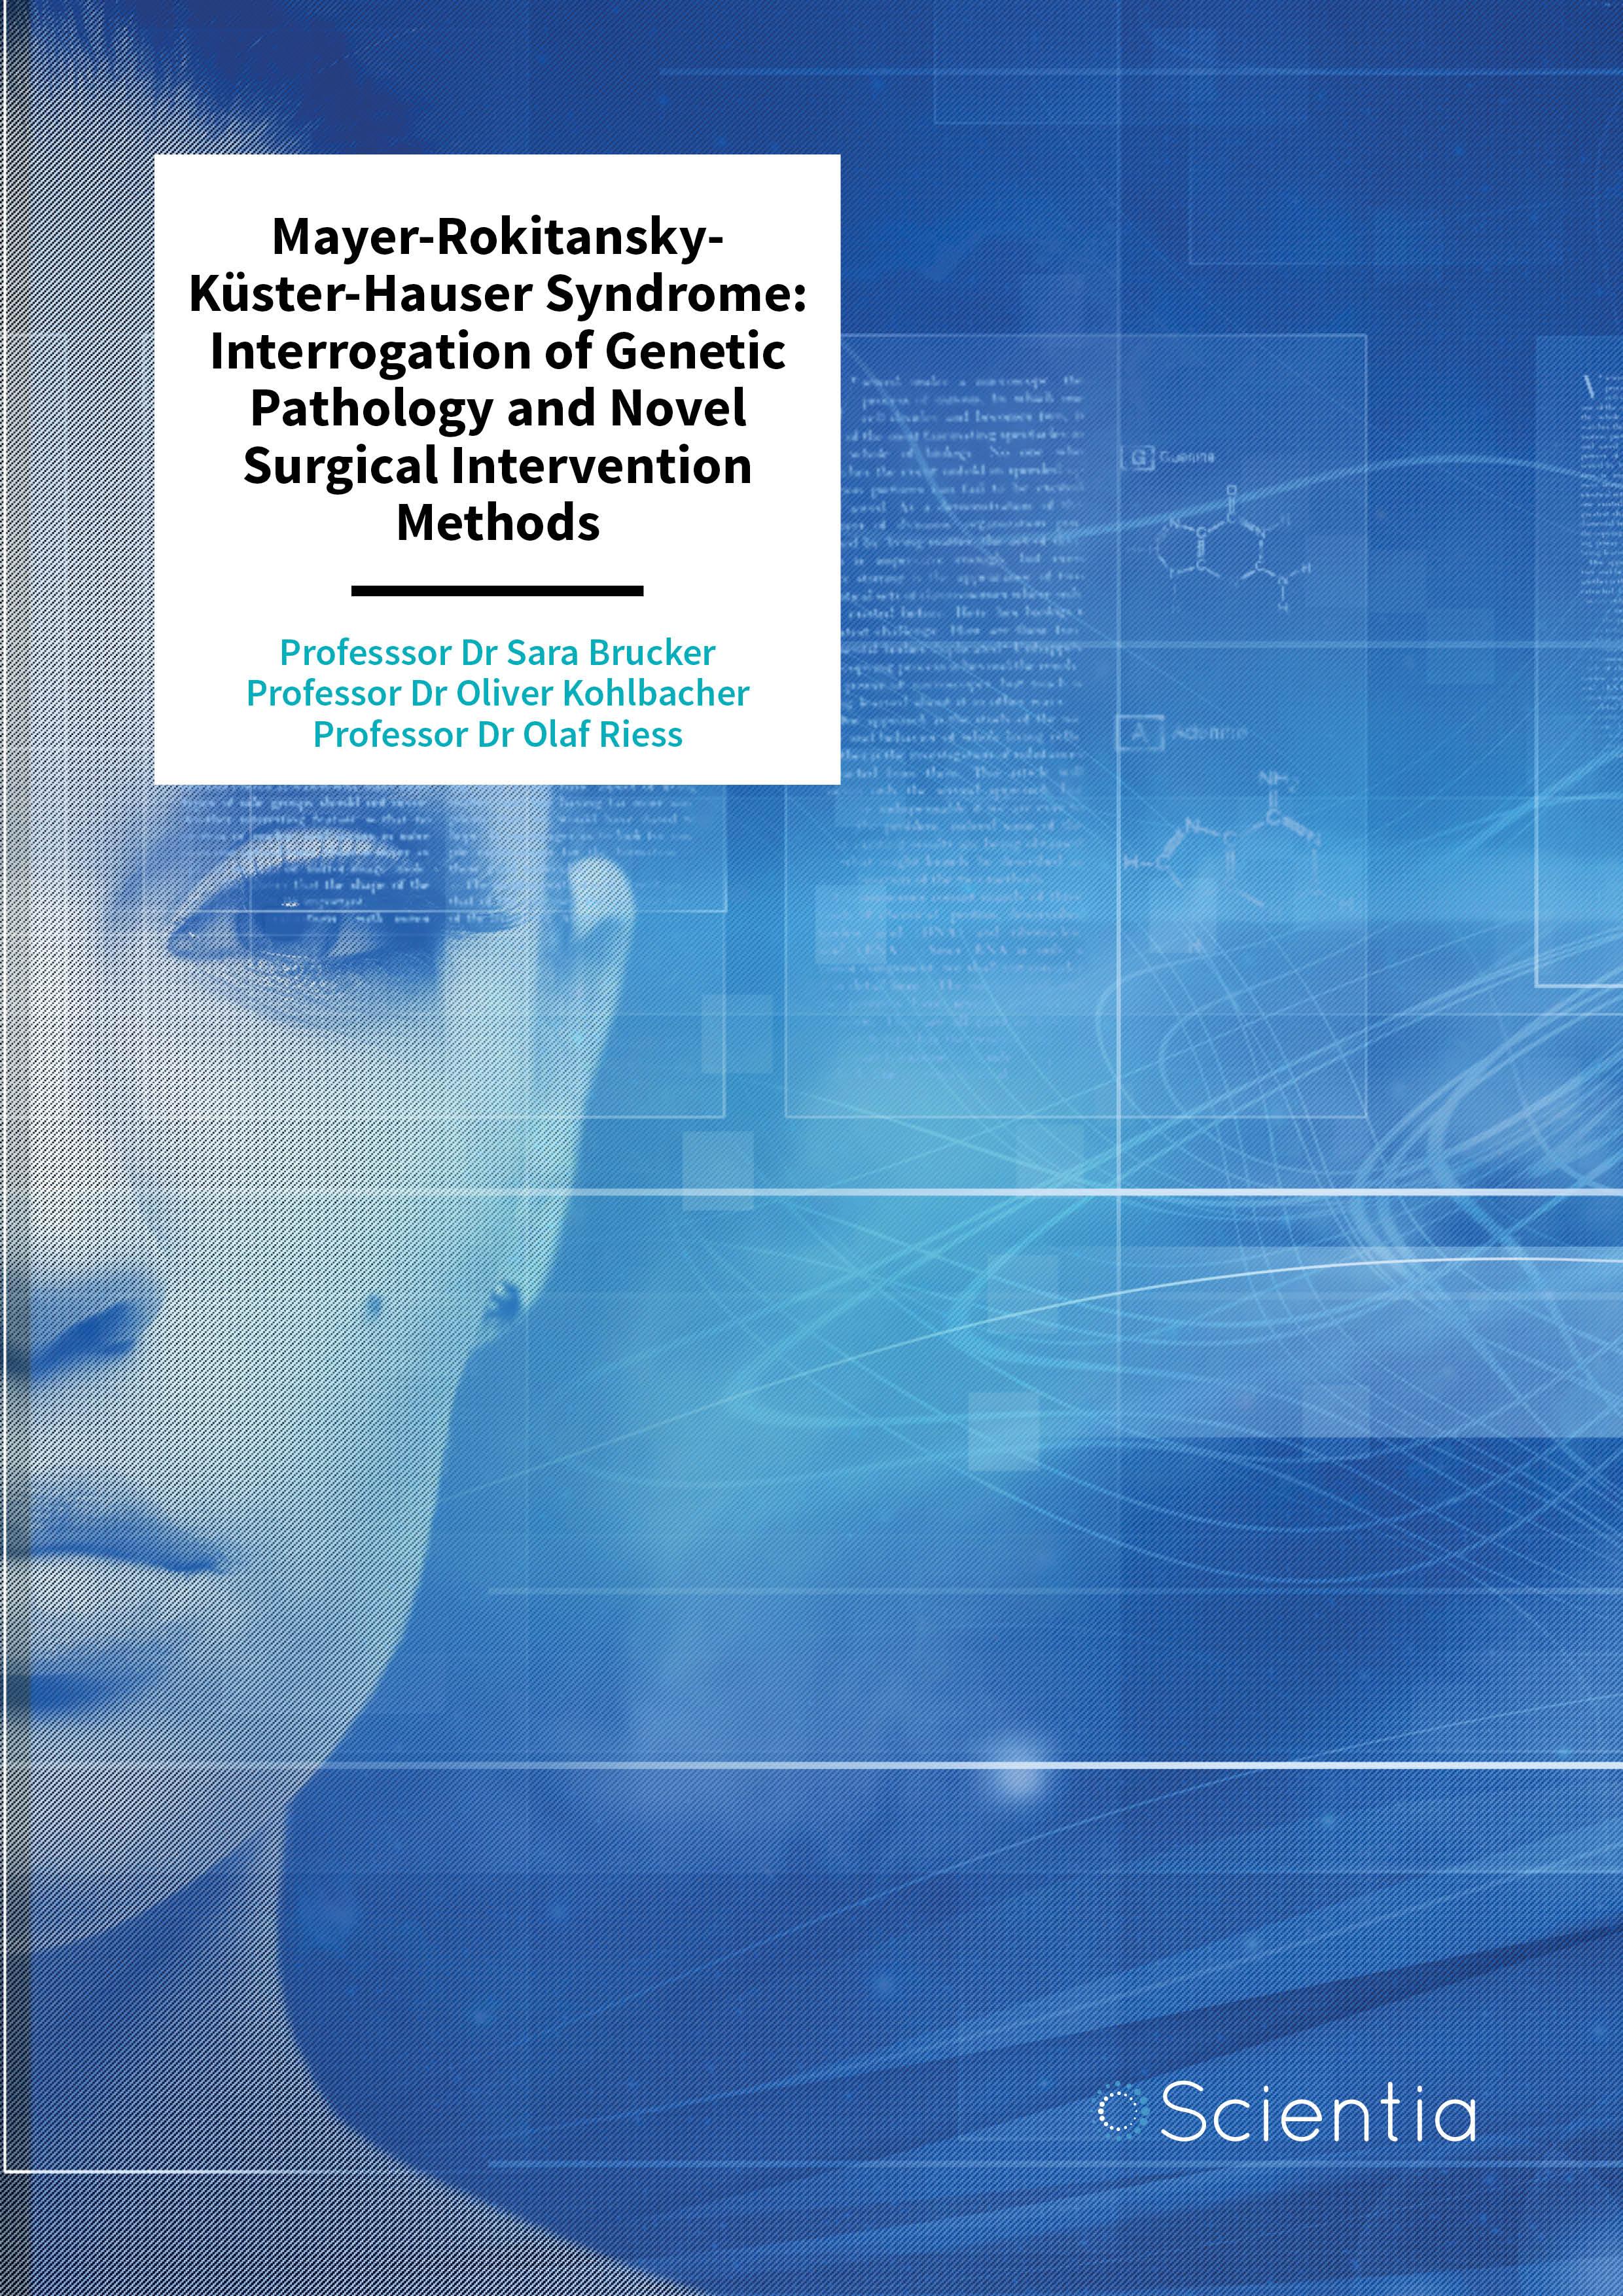 Professor Sara Brucker | Professor Olaf Riess | Professor Oliver Kohlbacher – Mayer-Rokitansky-Küster-Hauser Syndrome: Interrogation of Genetic Pathology and Novel Surgical Intervention Methods